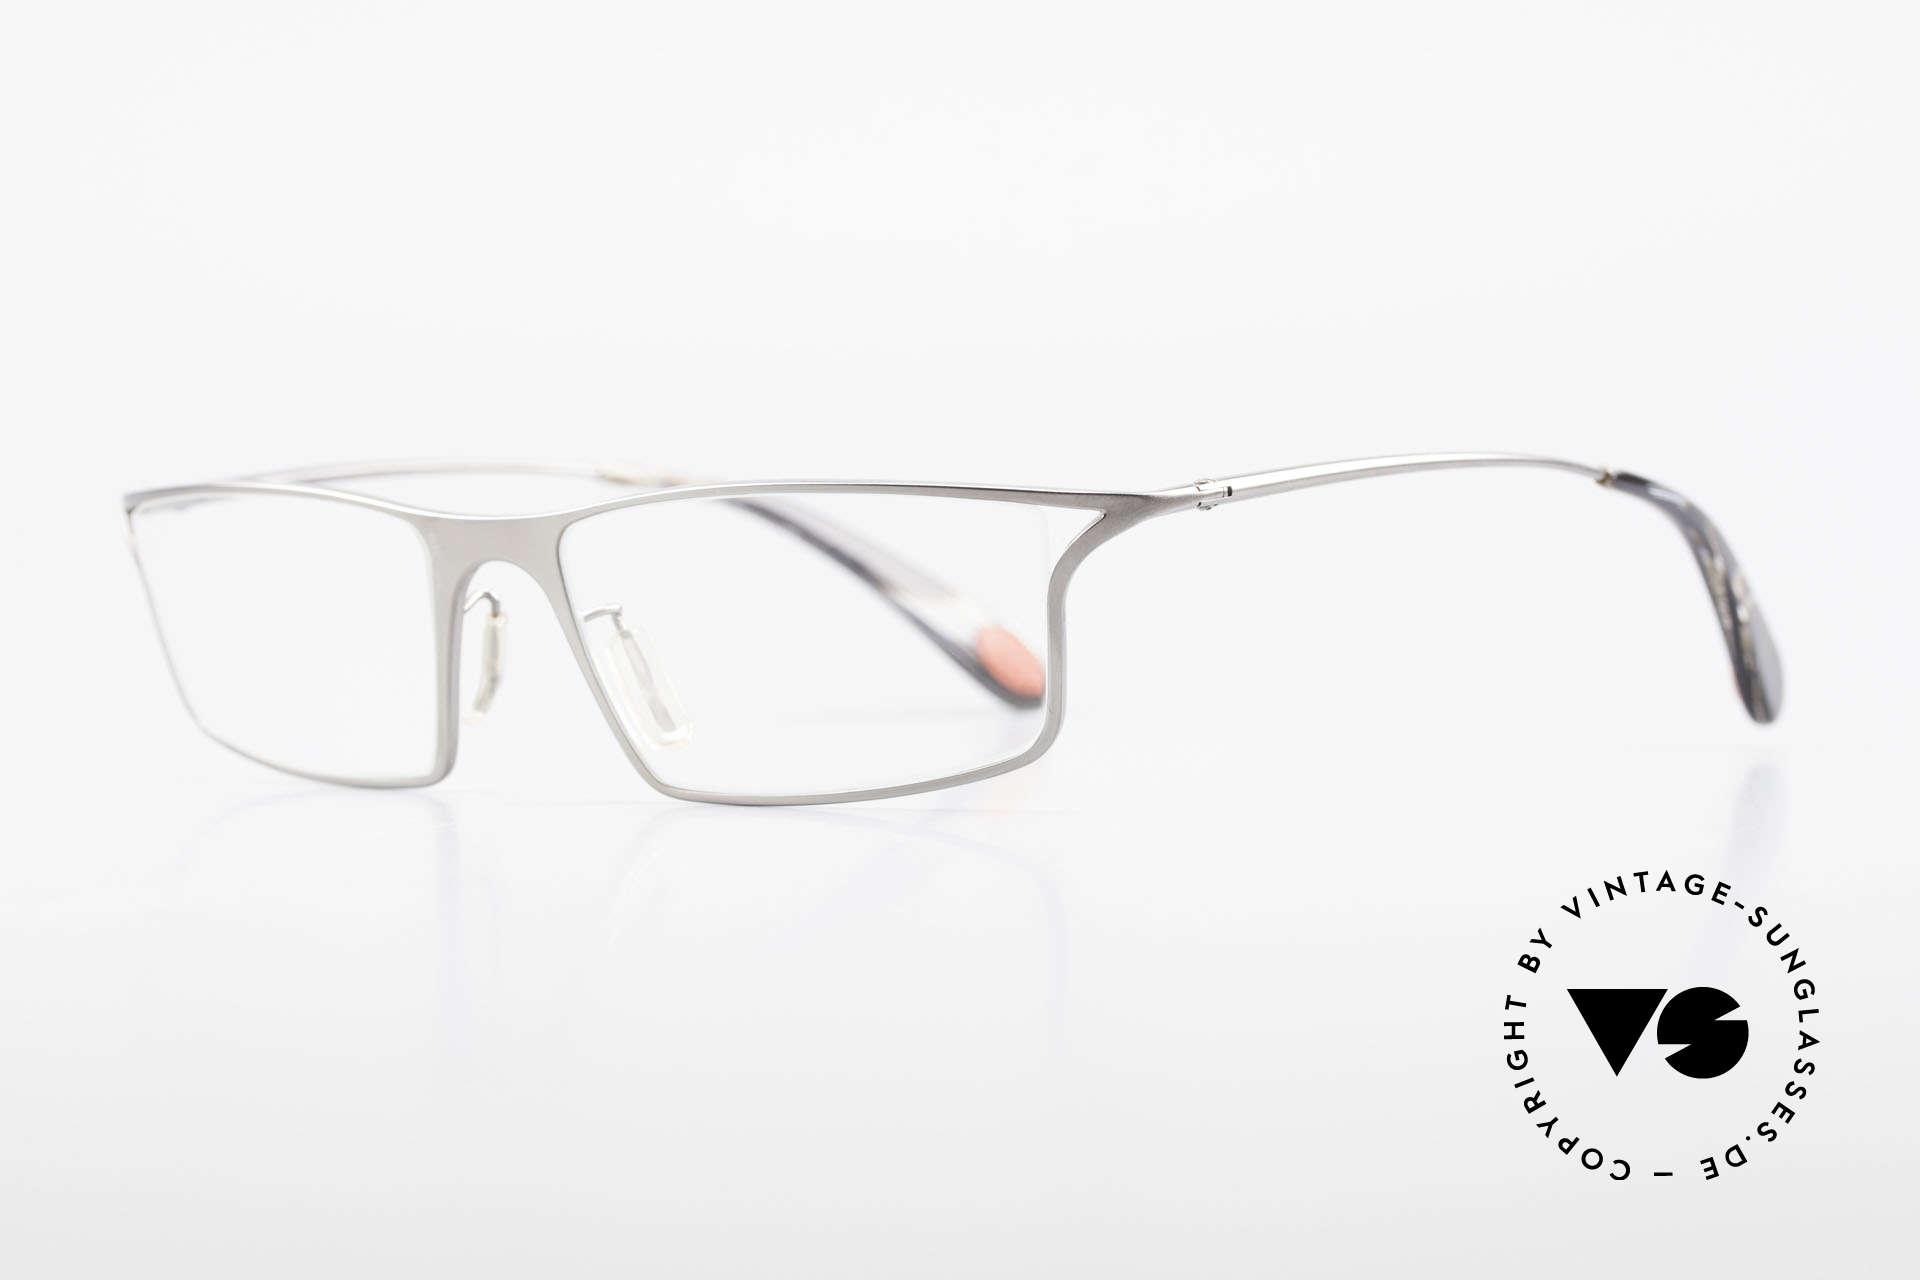 Bugatti 353 Odotype Vintage Luxury Eyeglass Frame, high-tech frame & brilliant lens construction, Made for Men